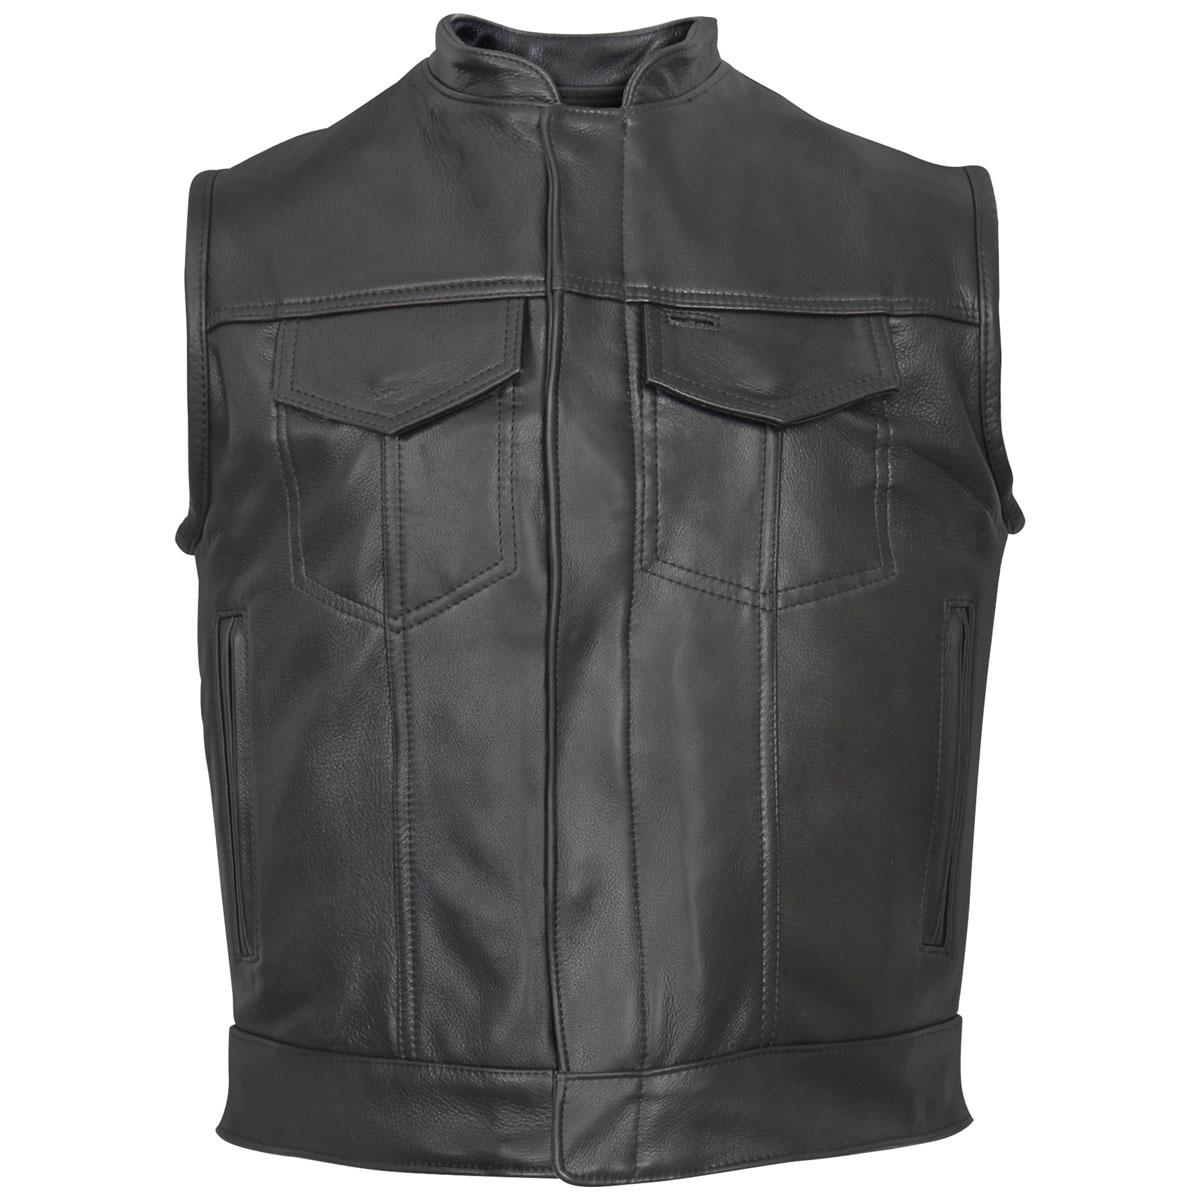 Hot Leathers Men's USA Made Concealed Zipper Black Leather Vest